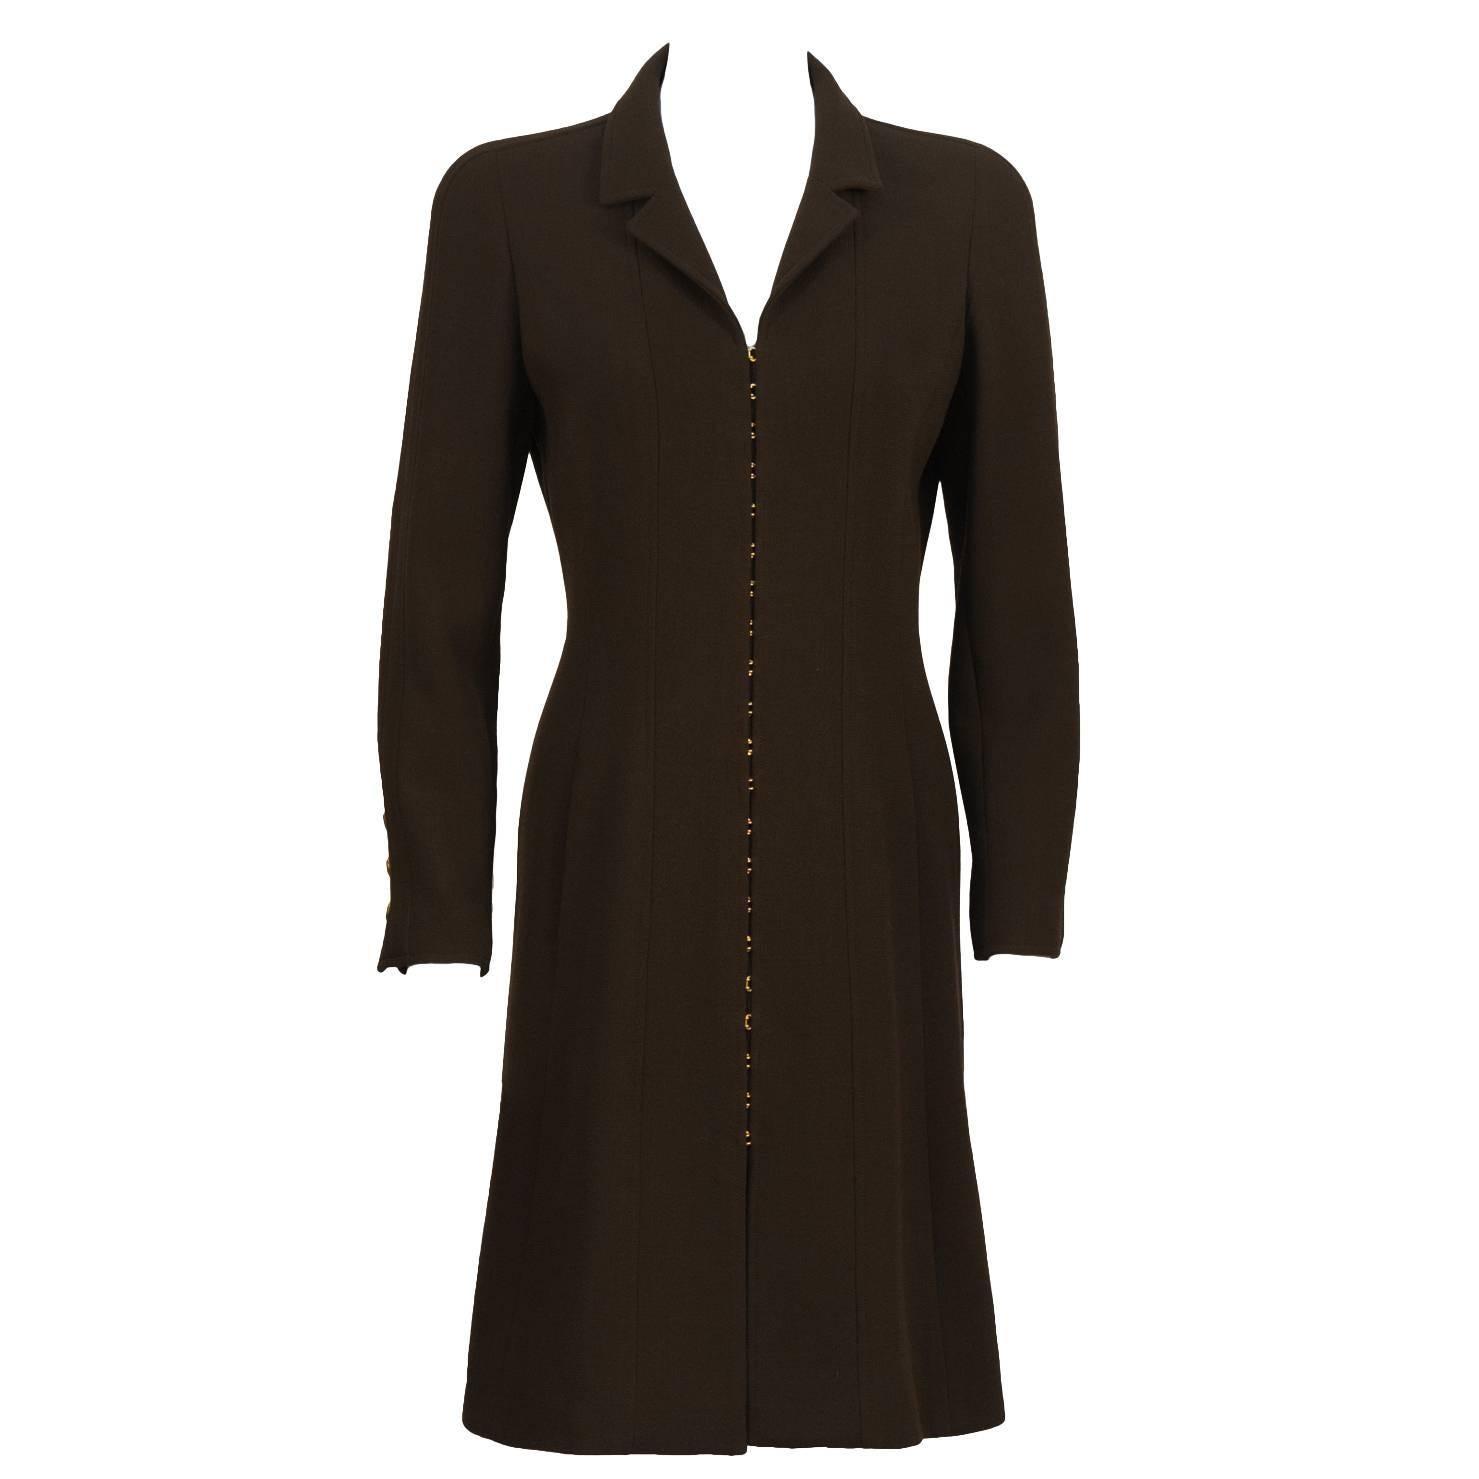 Fall 1996 Chanel Brown Wool Coat Dress